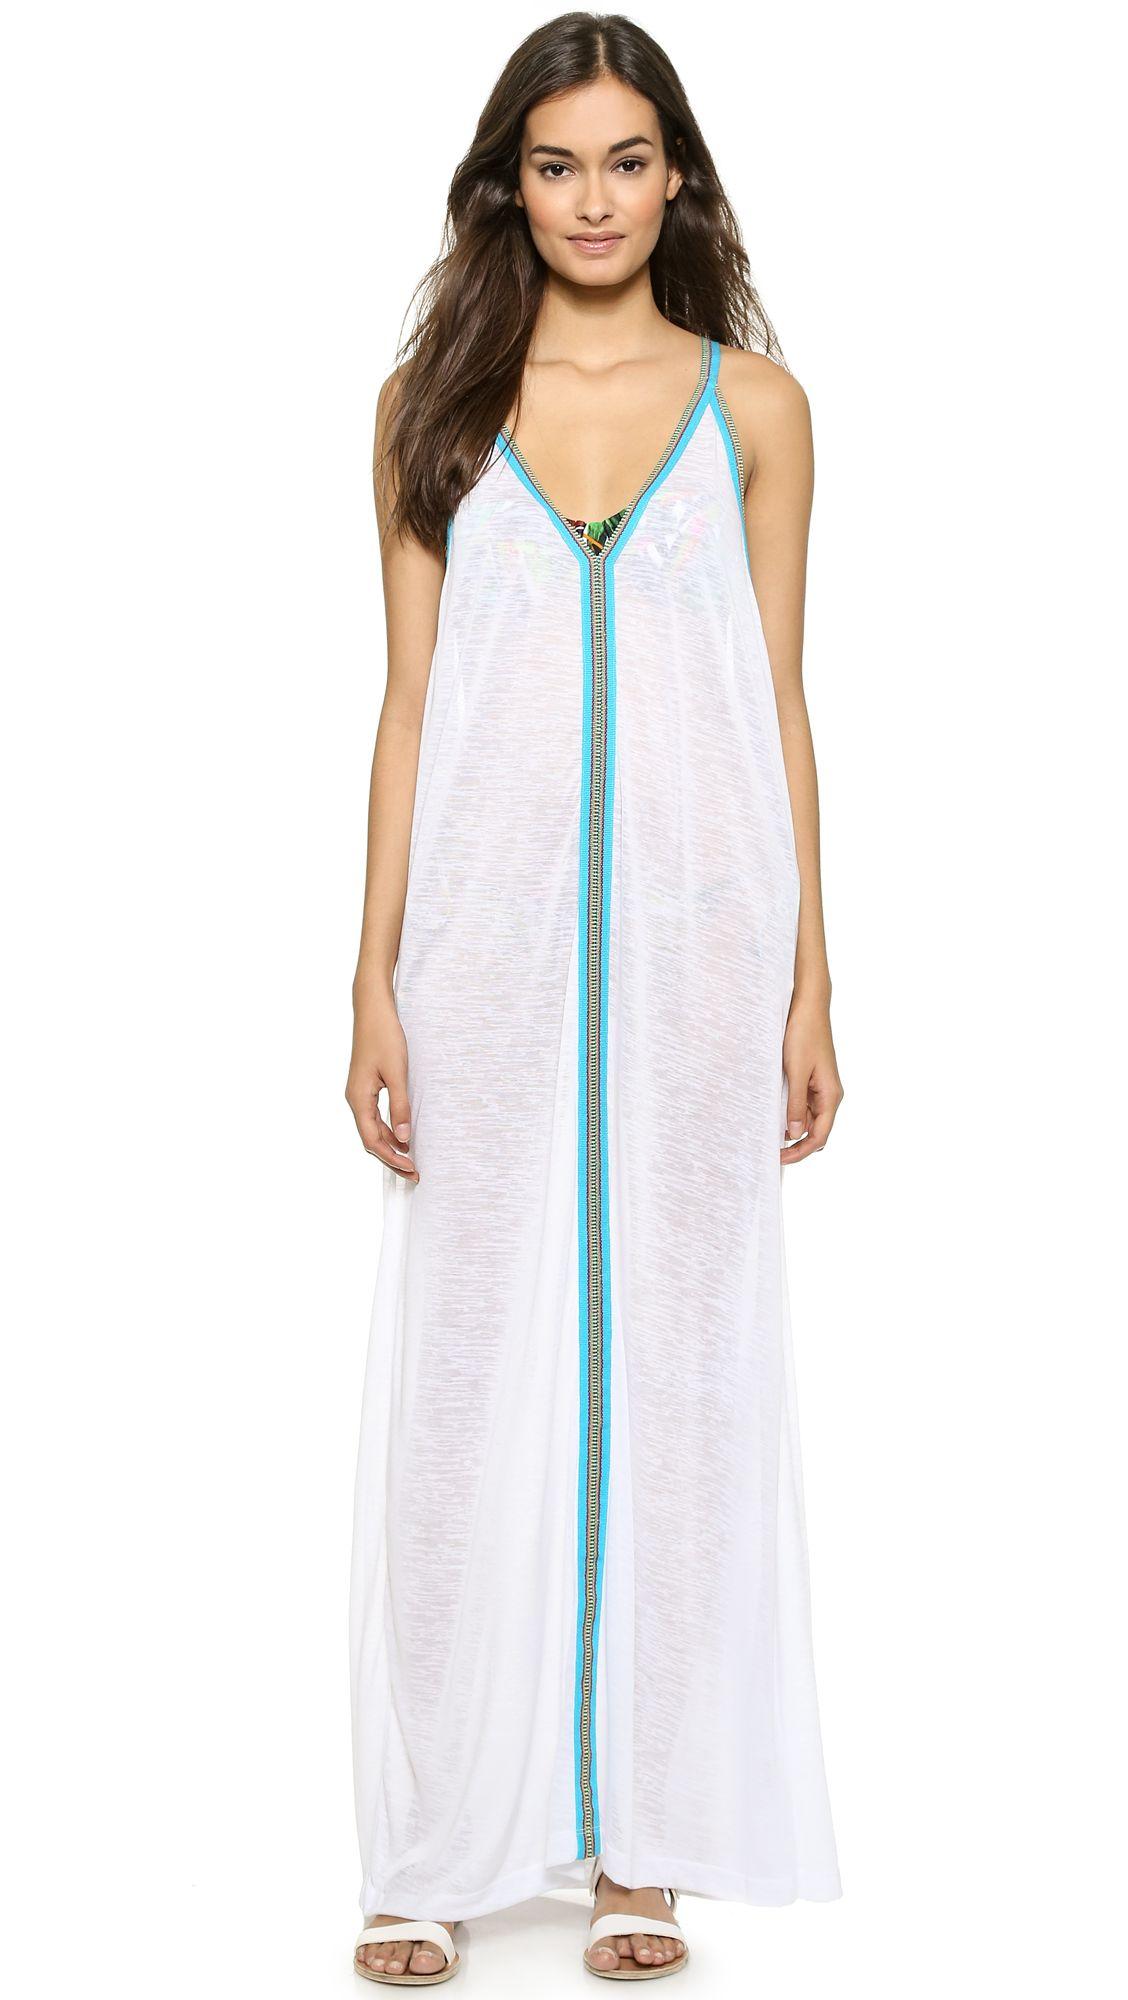 Sun Maxi Dress White Maxi Dresses Dresses Clothes